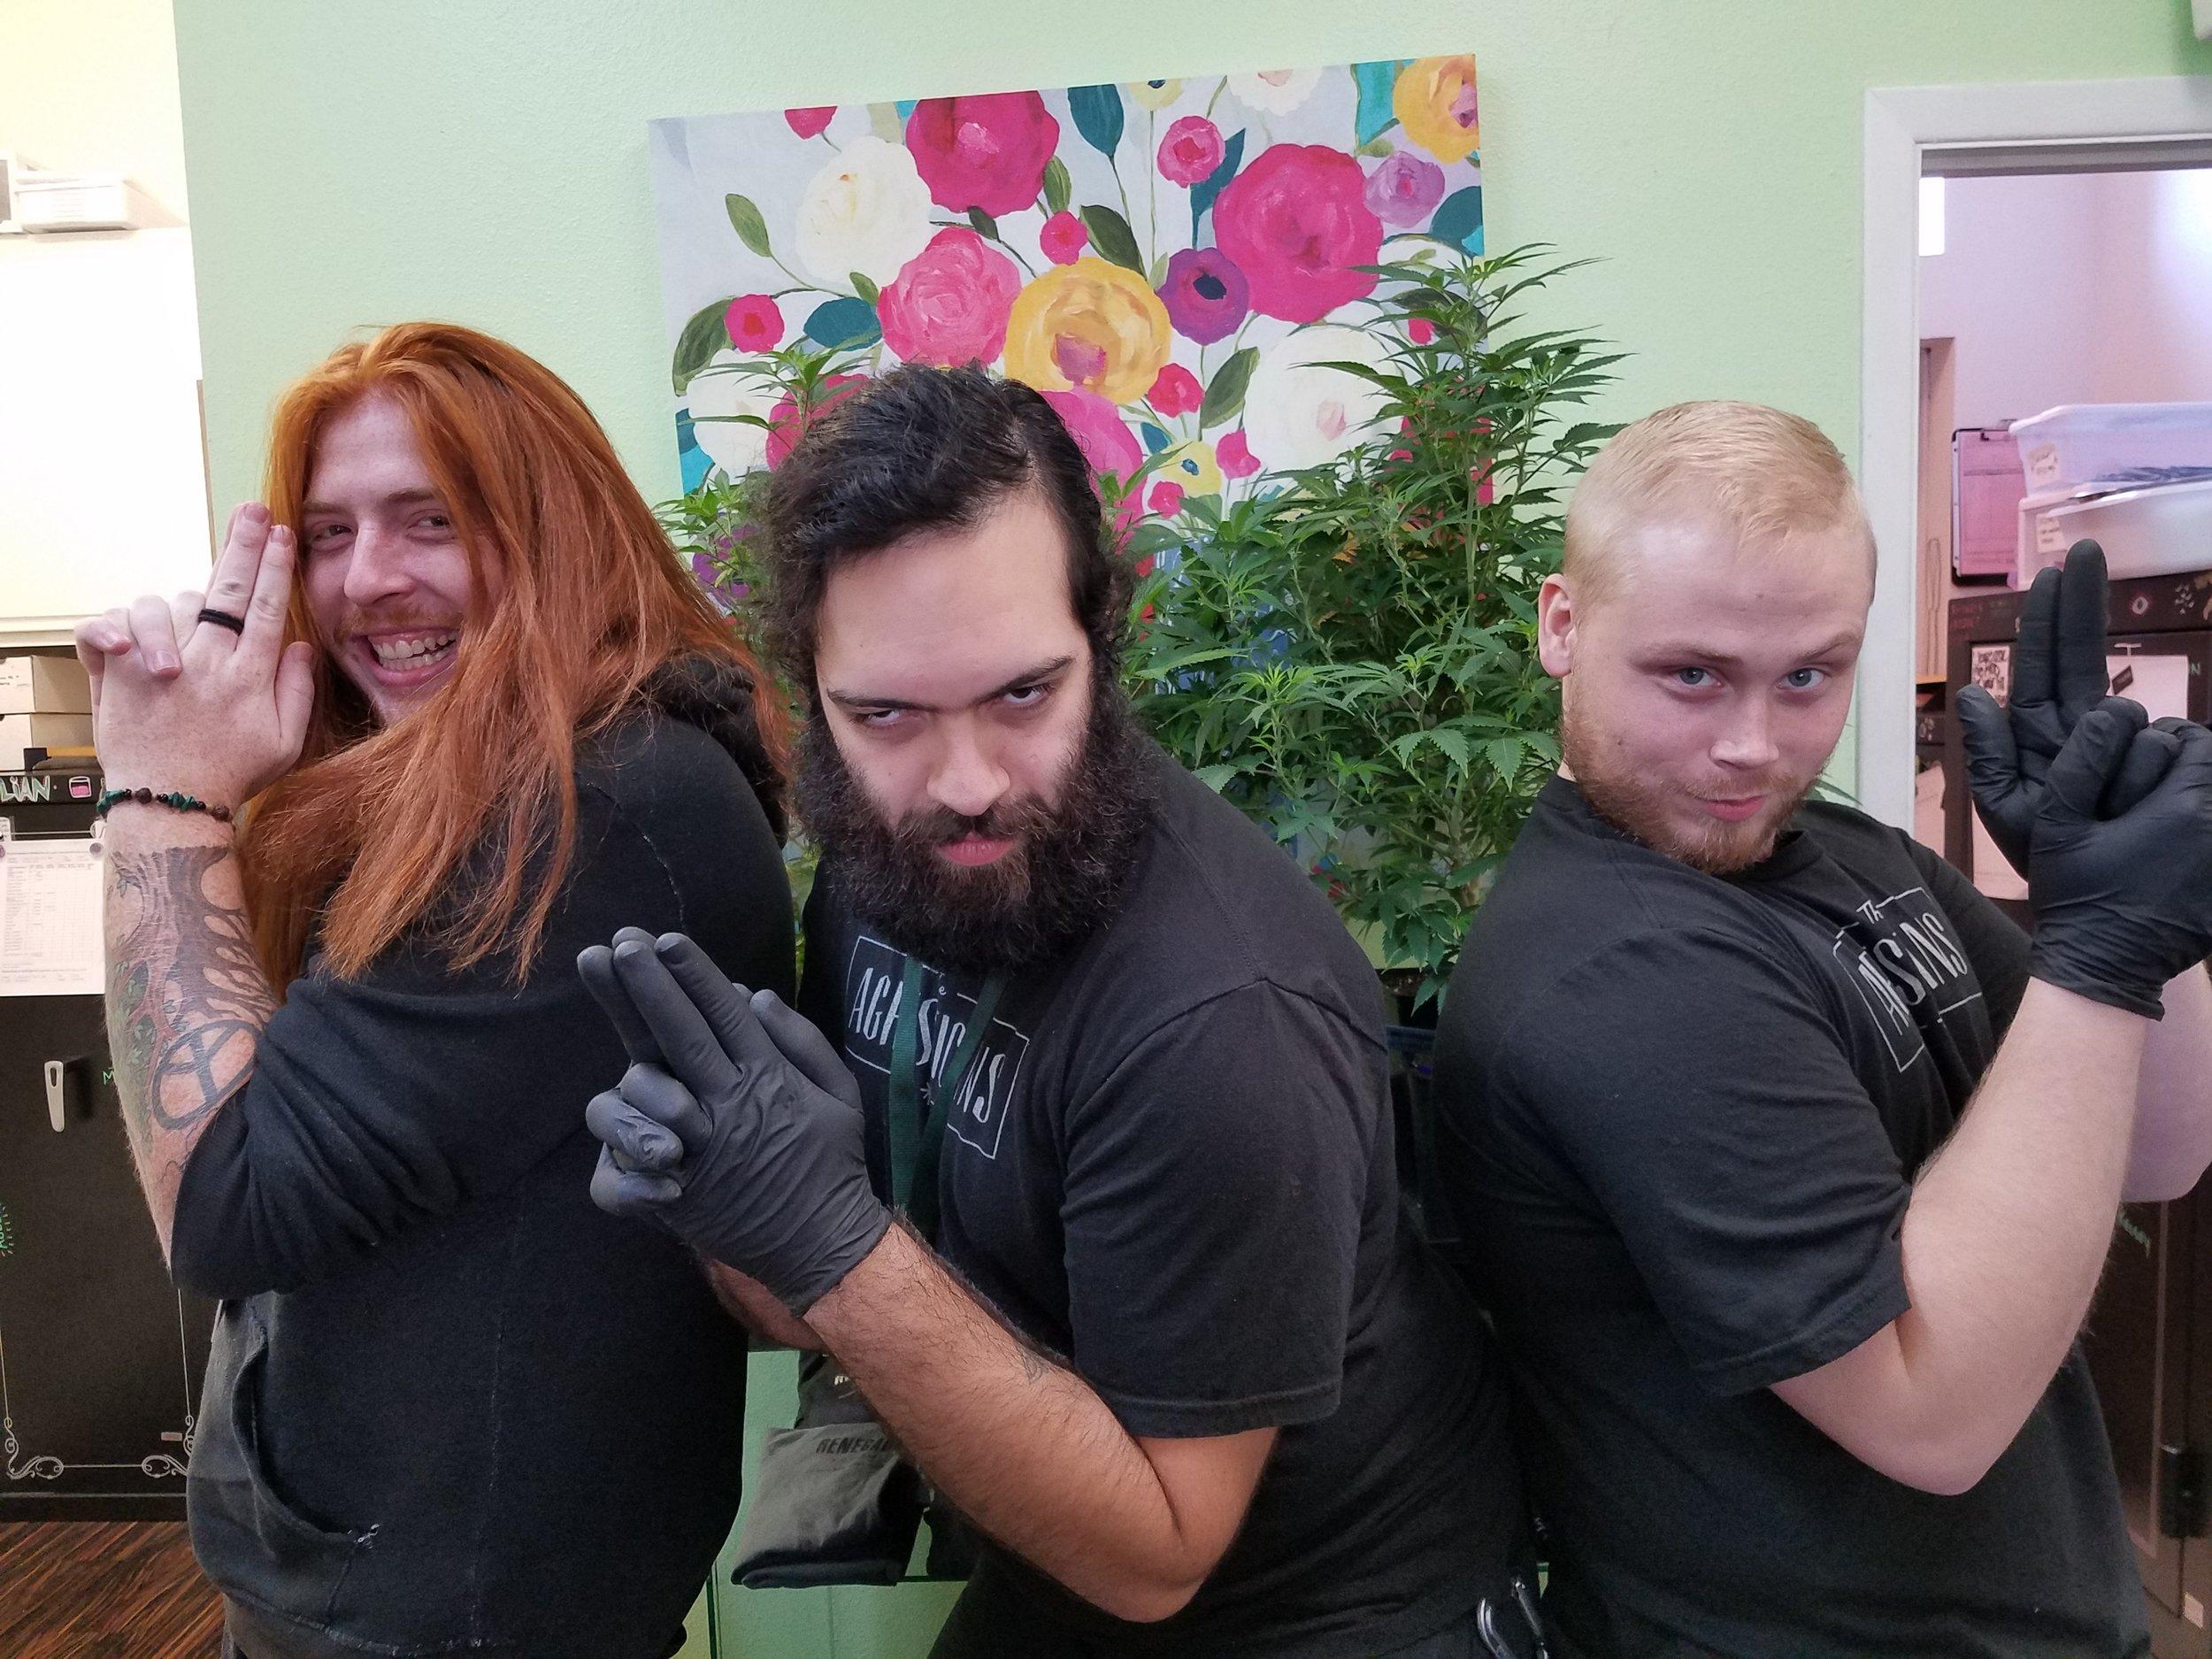 Devin, Jesse, and Dan